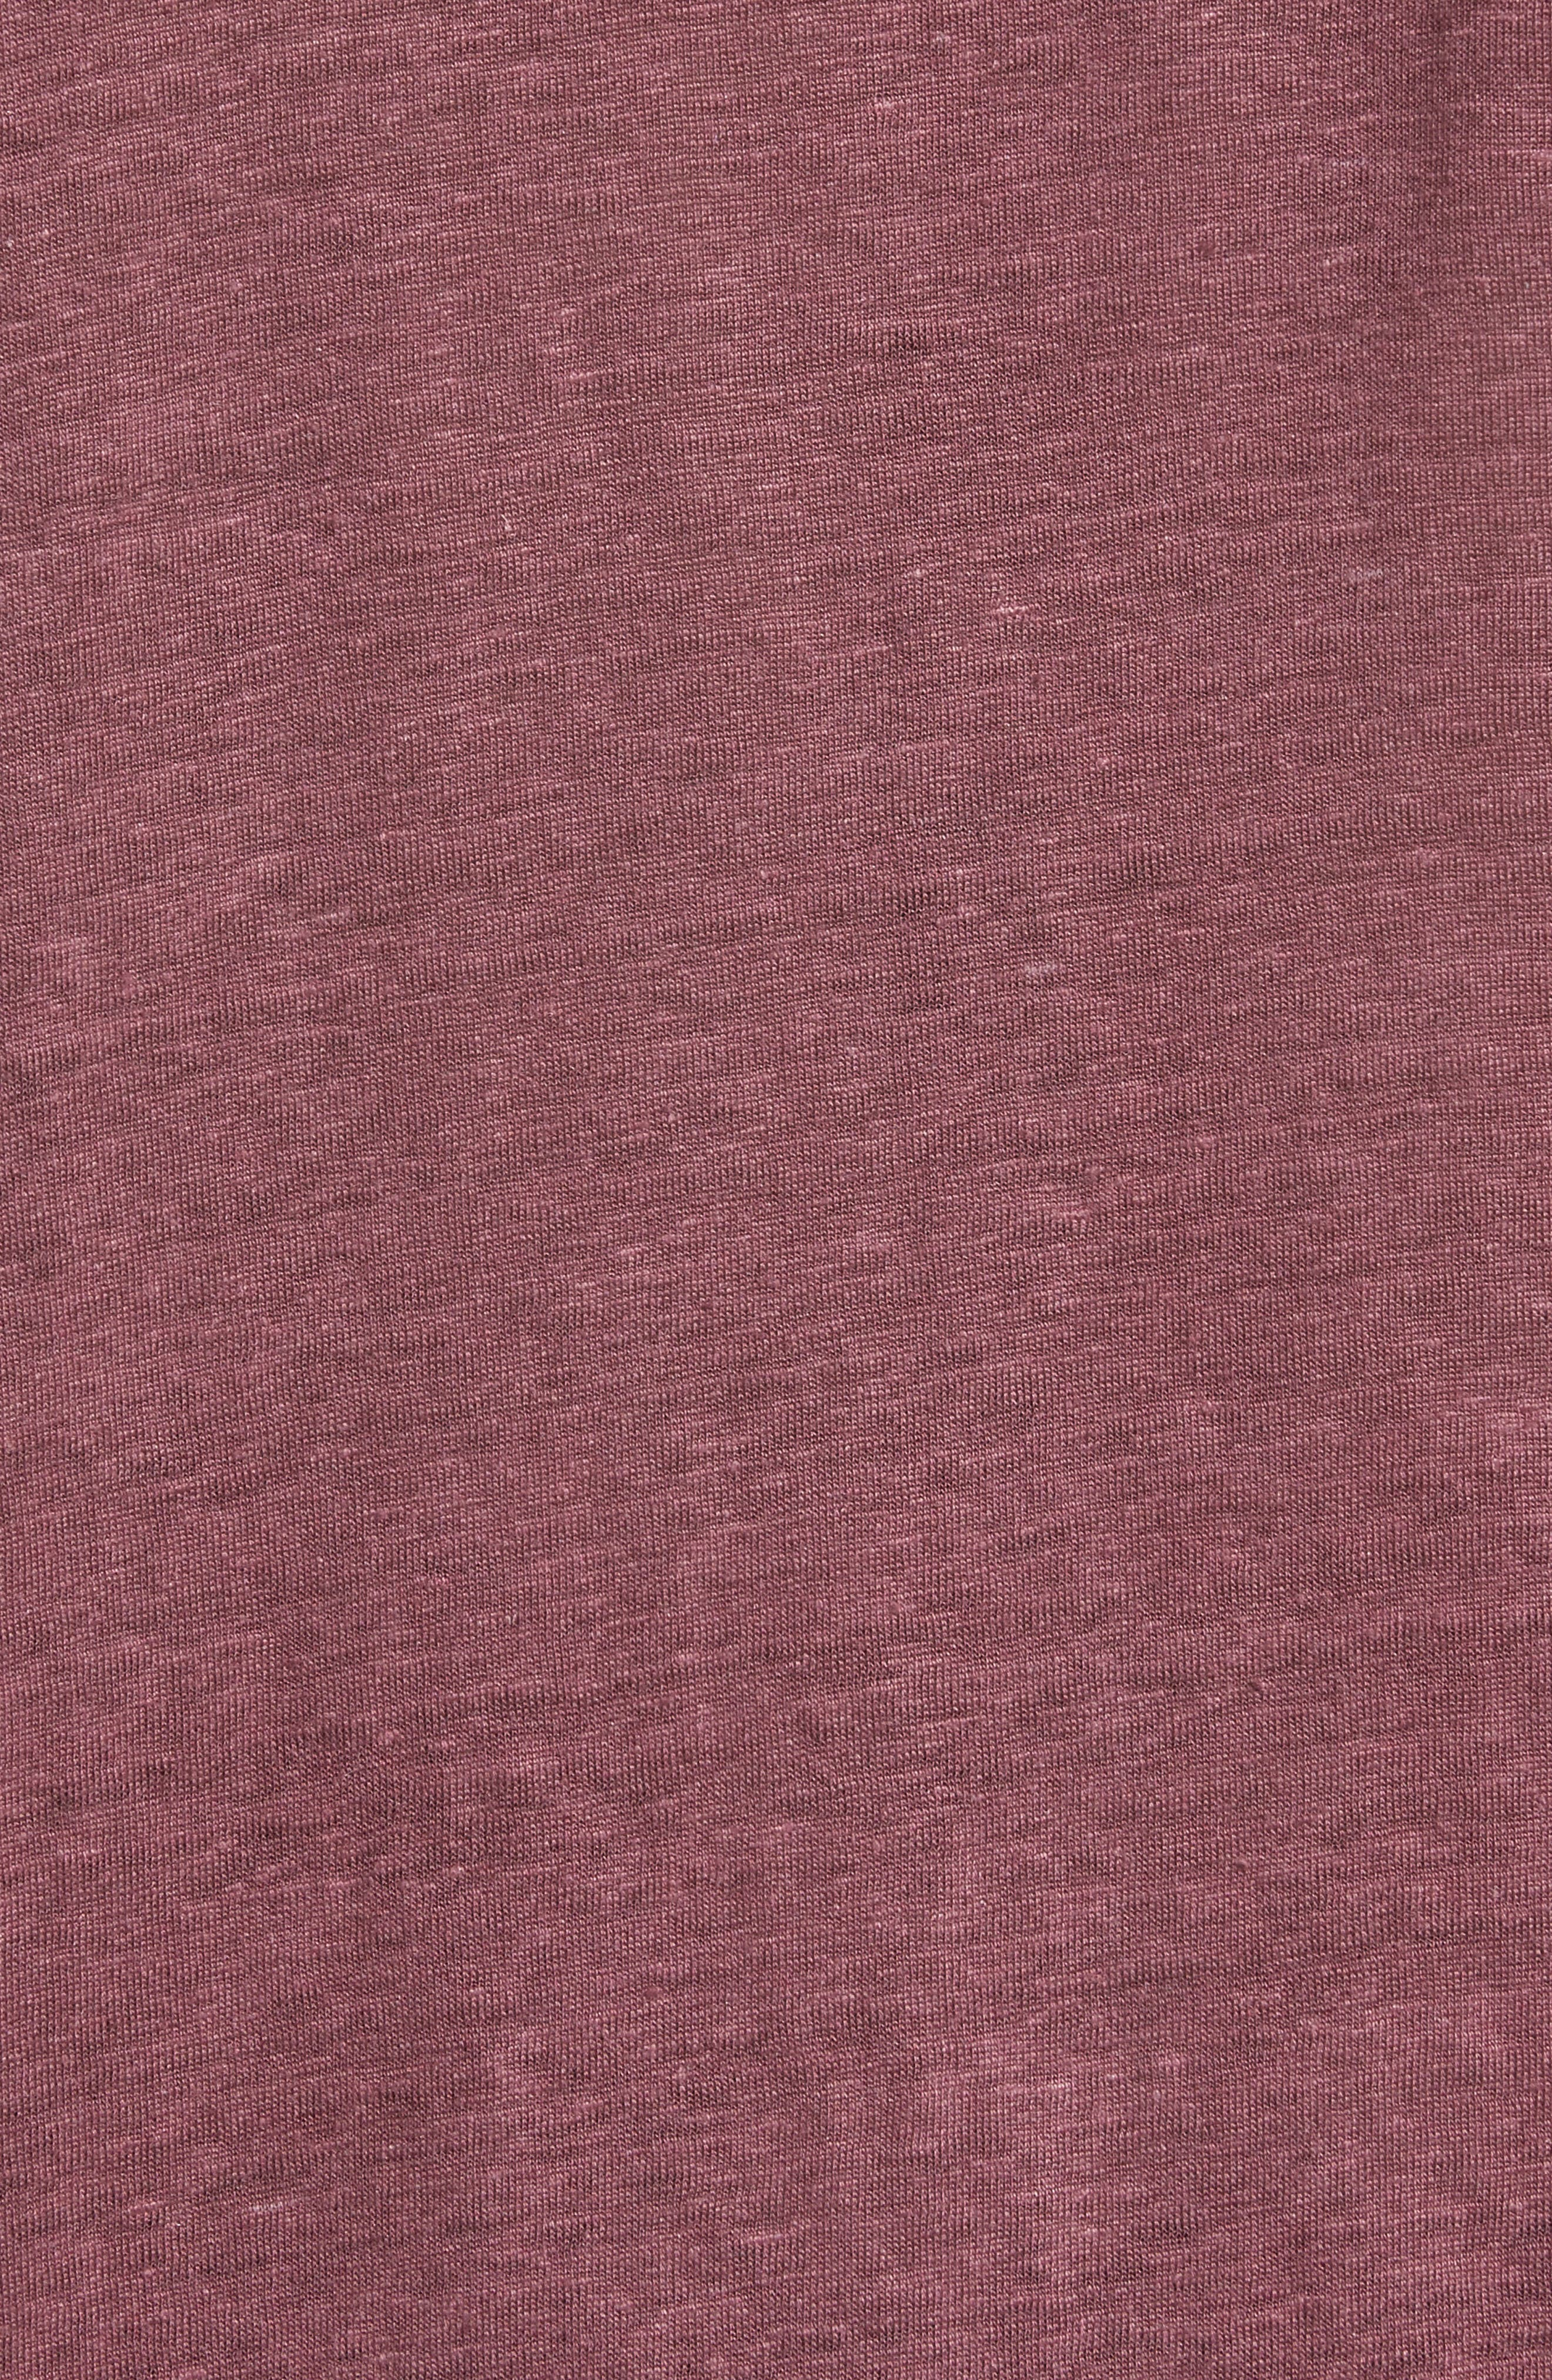 Collection Linen Henley,                             Alternate thumbnail 2, color,                             612